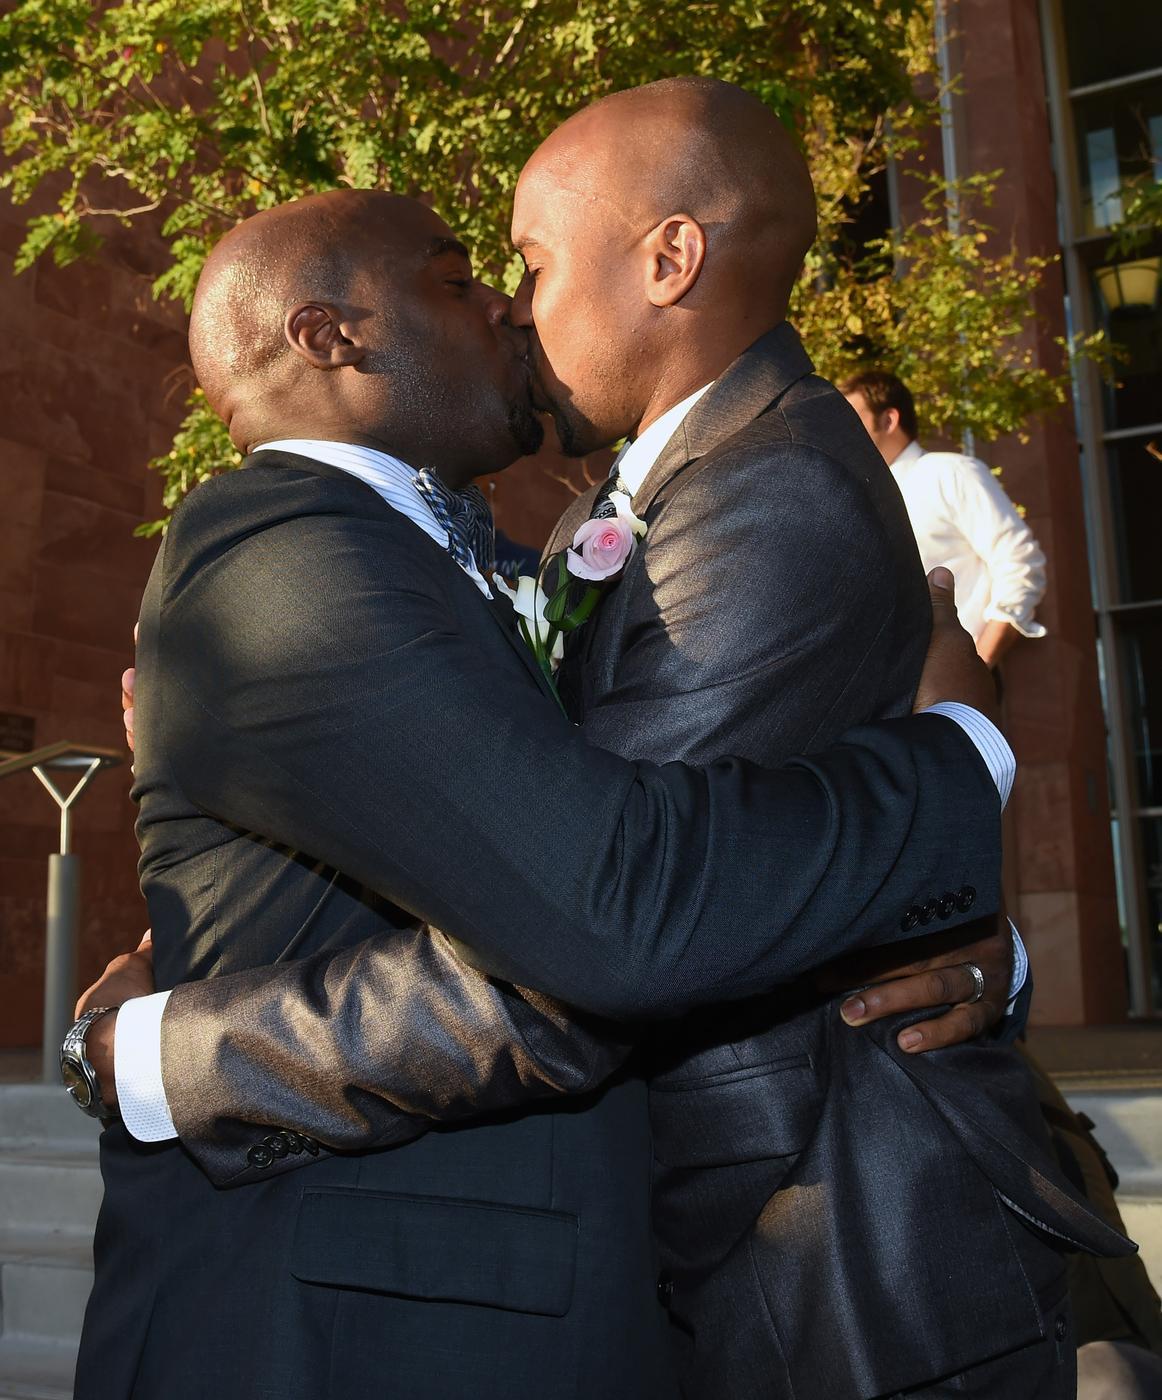 Gay Nevada state senator proposes to boyfriend live on TV